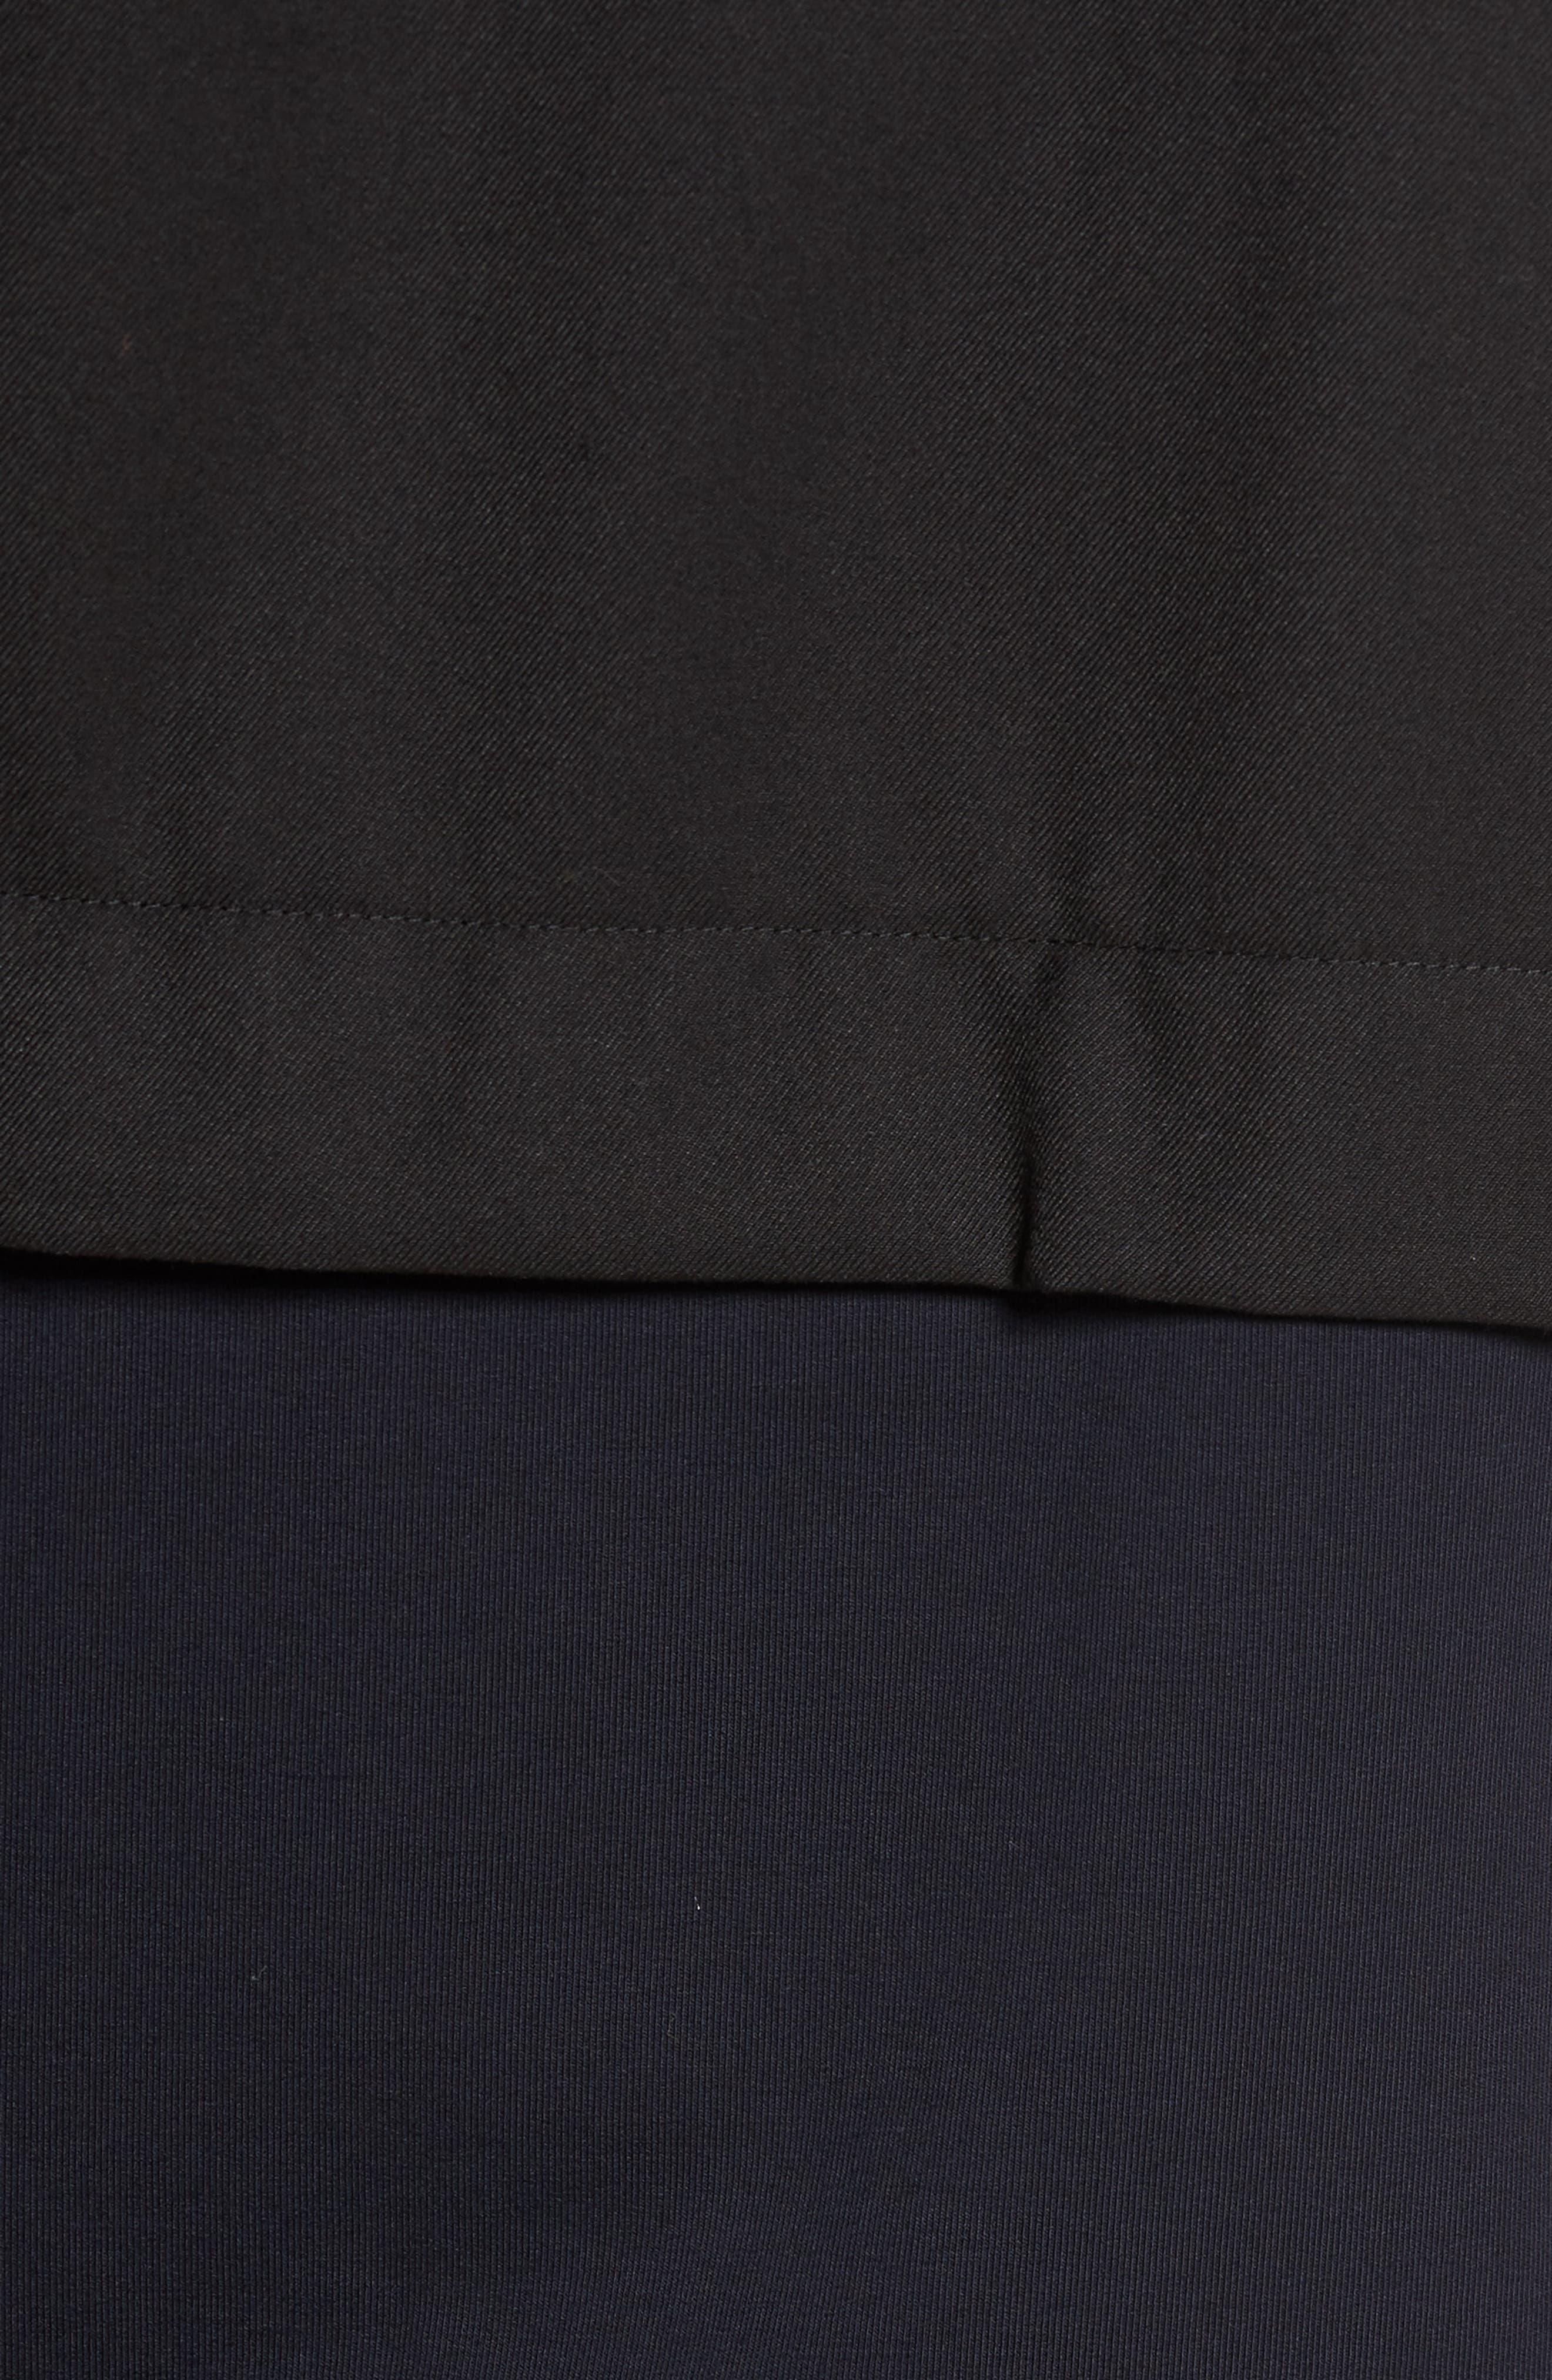 Fleece Zip Up Jacket,                             Alternate thumbnail 5, color,                             Black